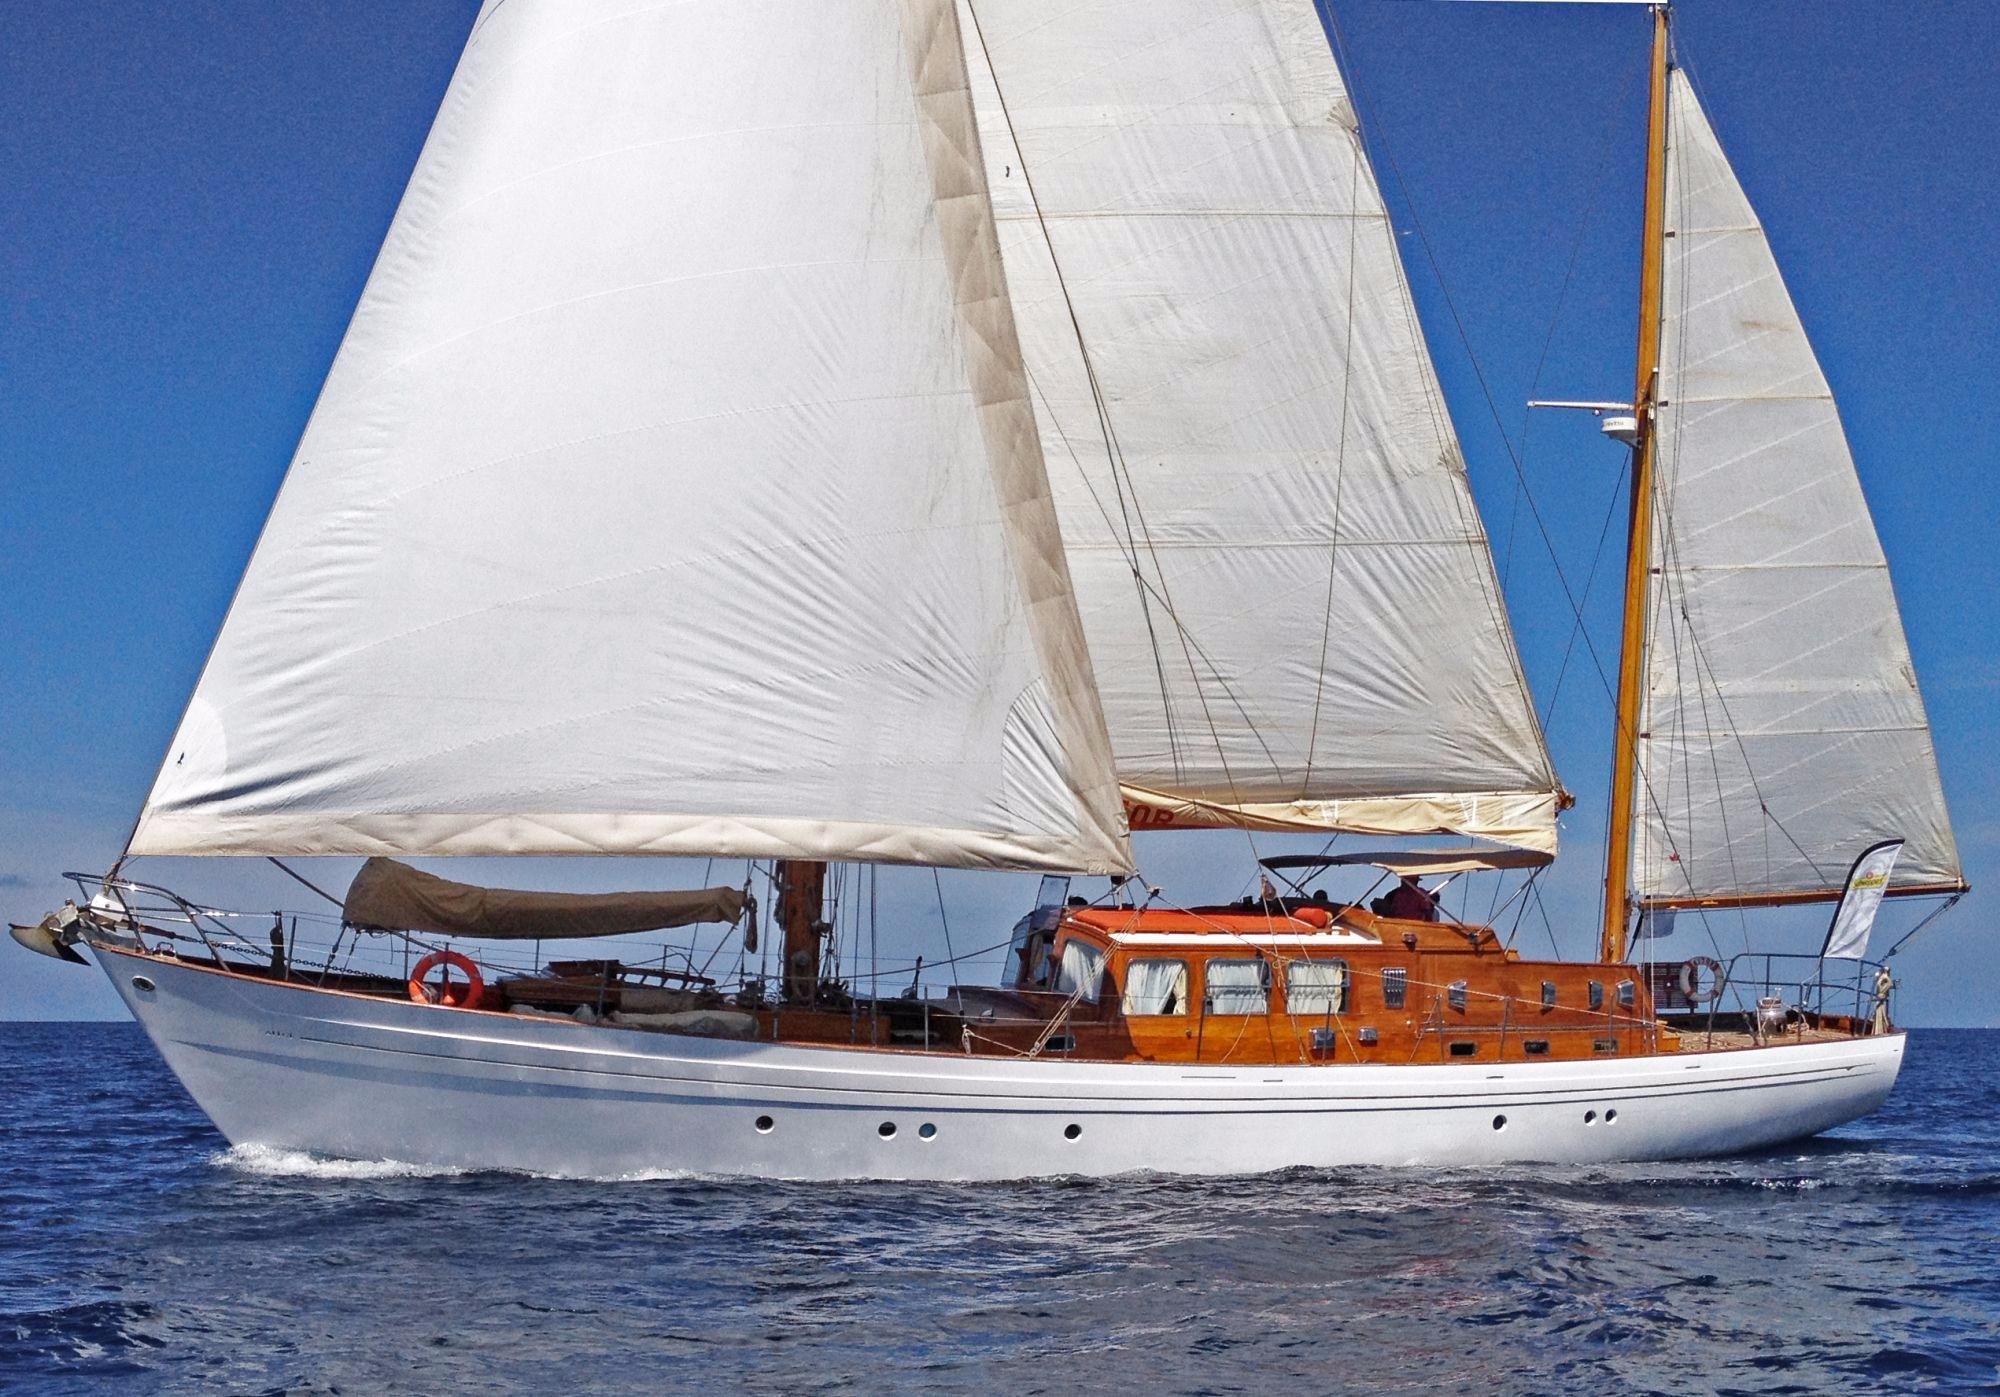 1964 Laurent Giles 72 Ft Motor Sailer Sail Boat For Sale